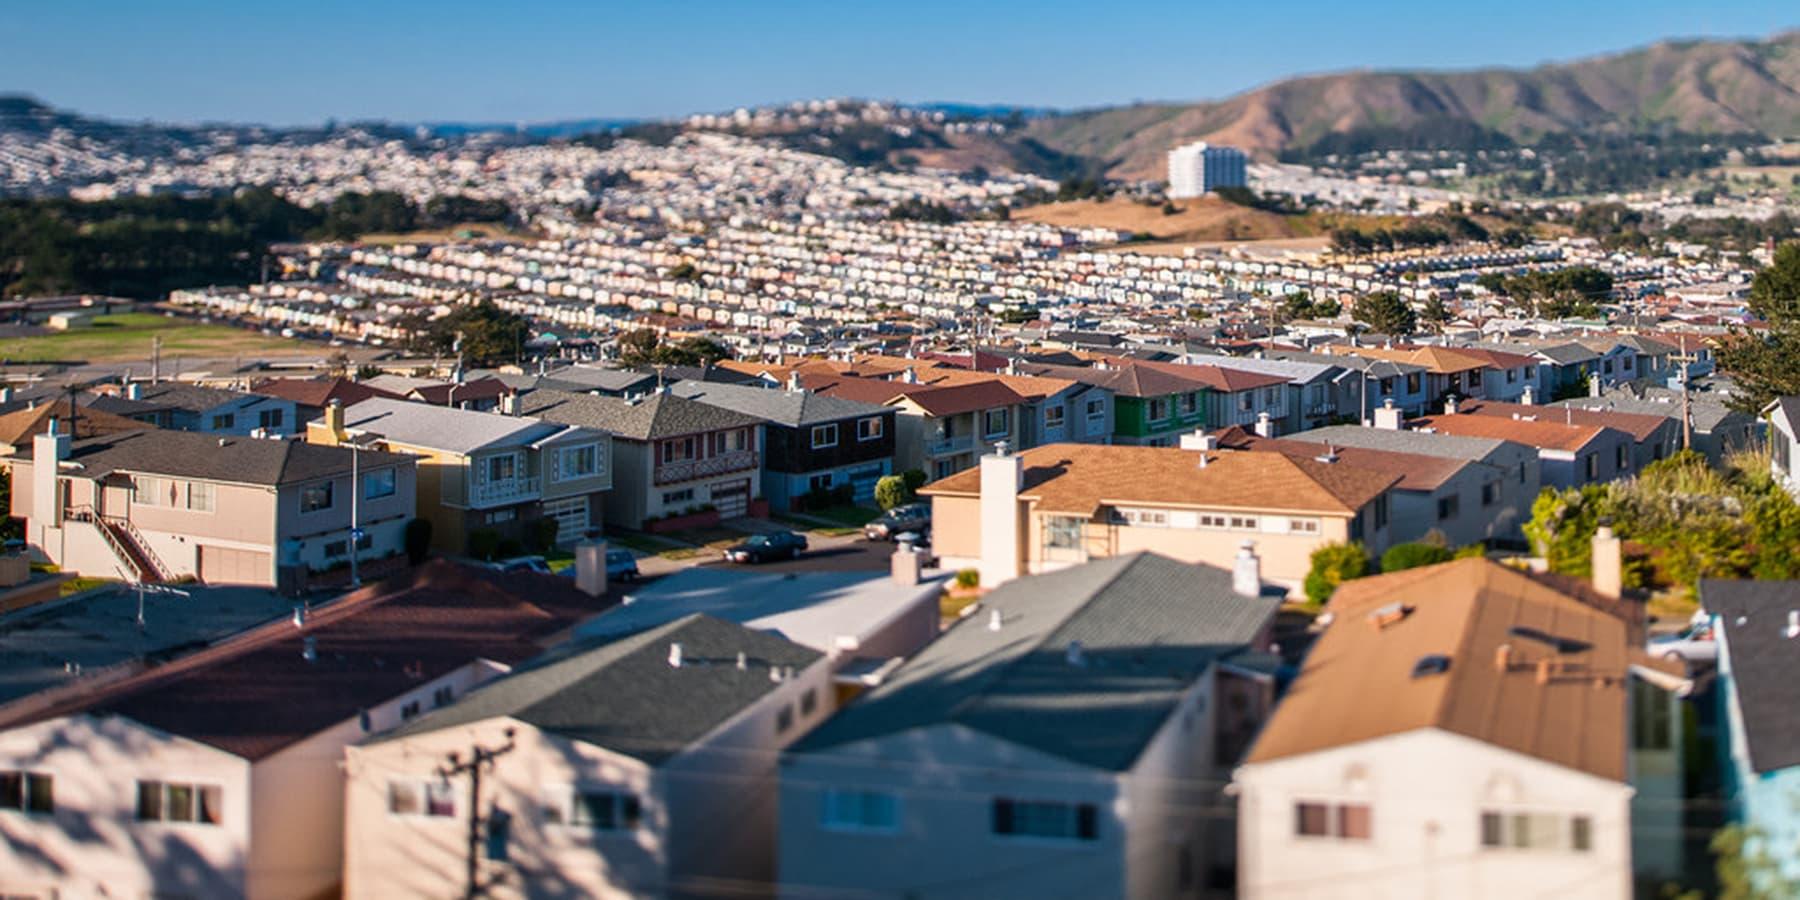 Aerial view of Daly City neighborhood